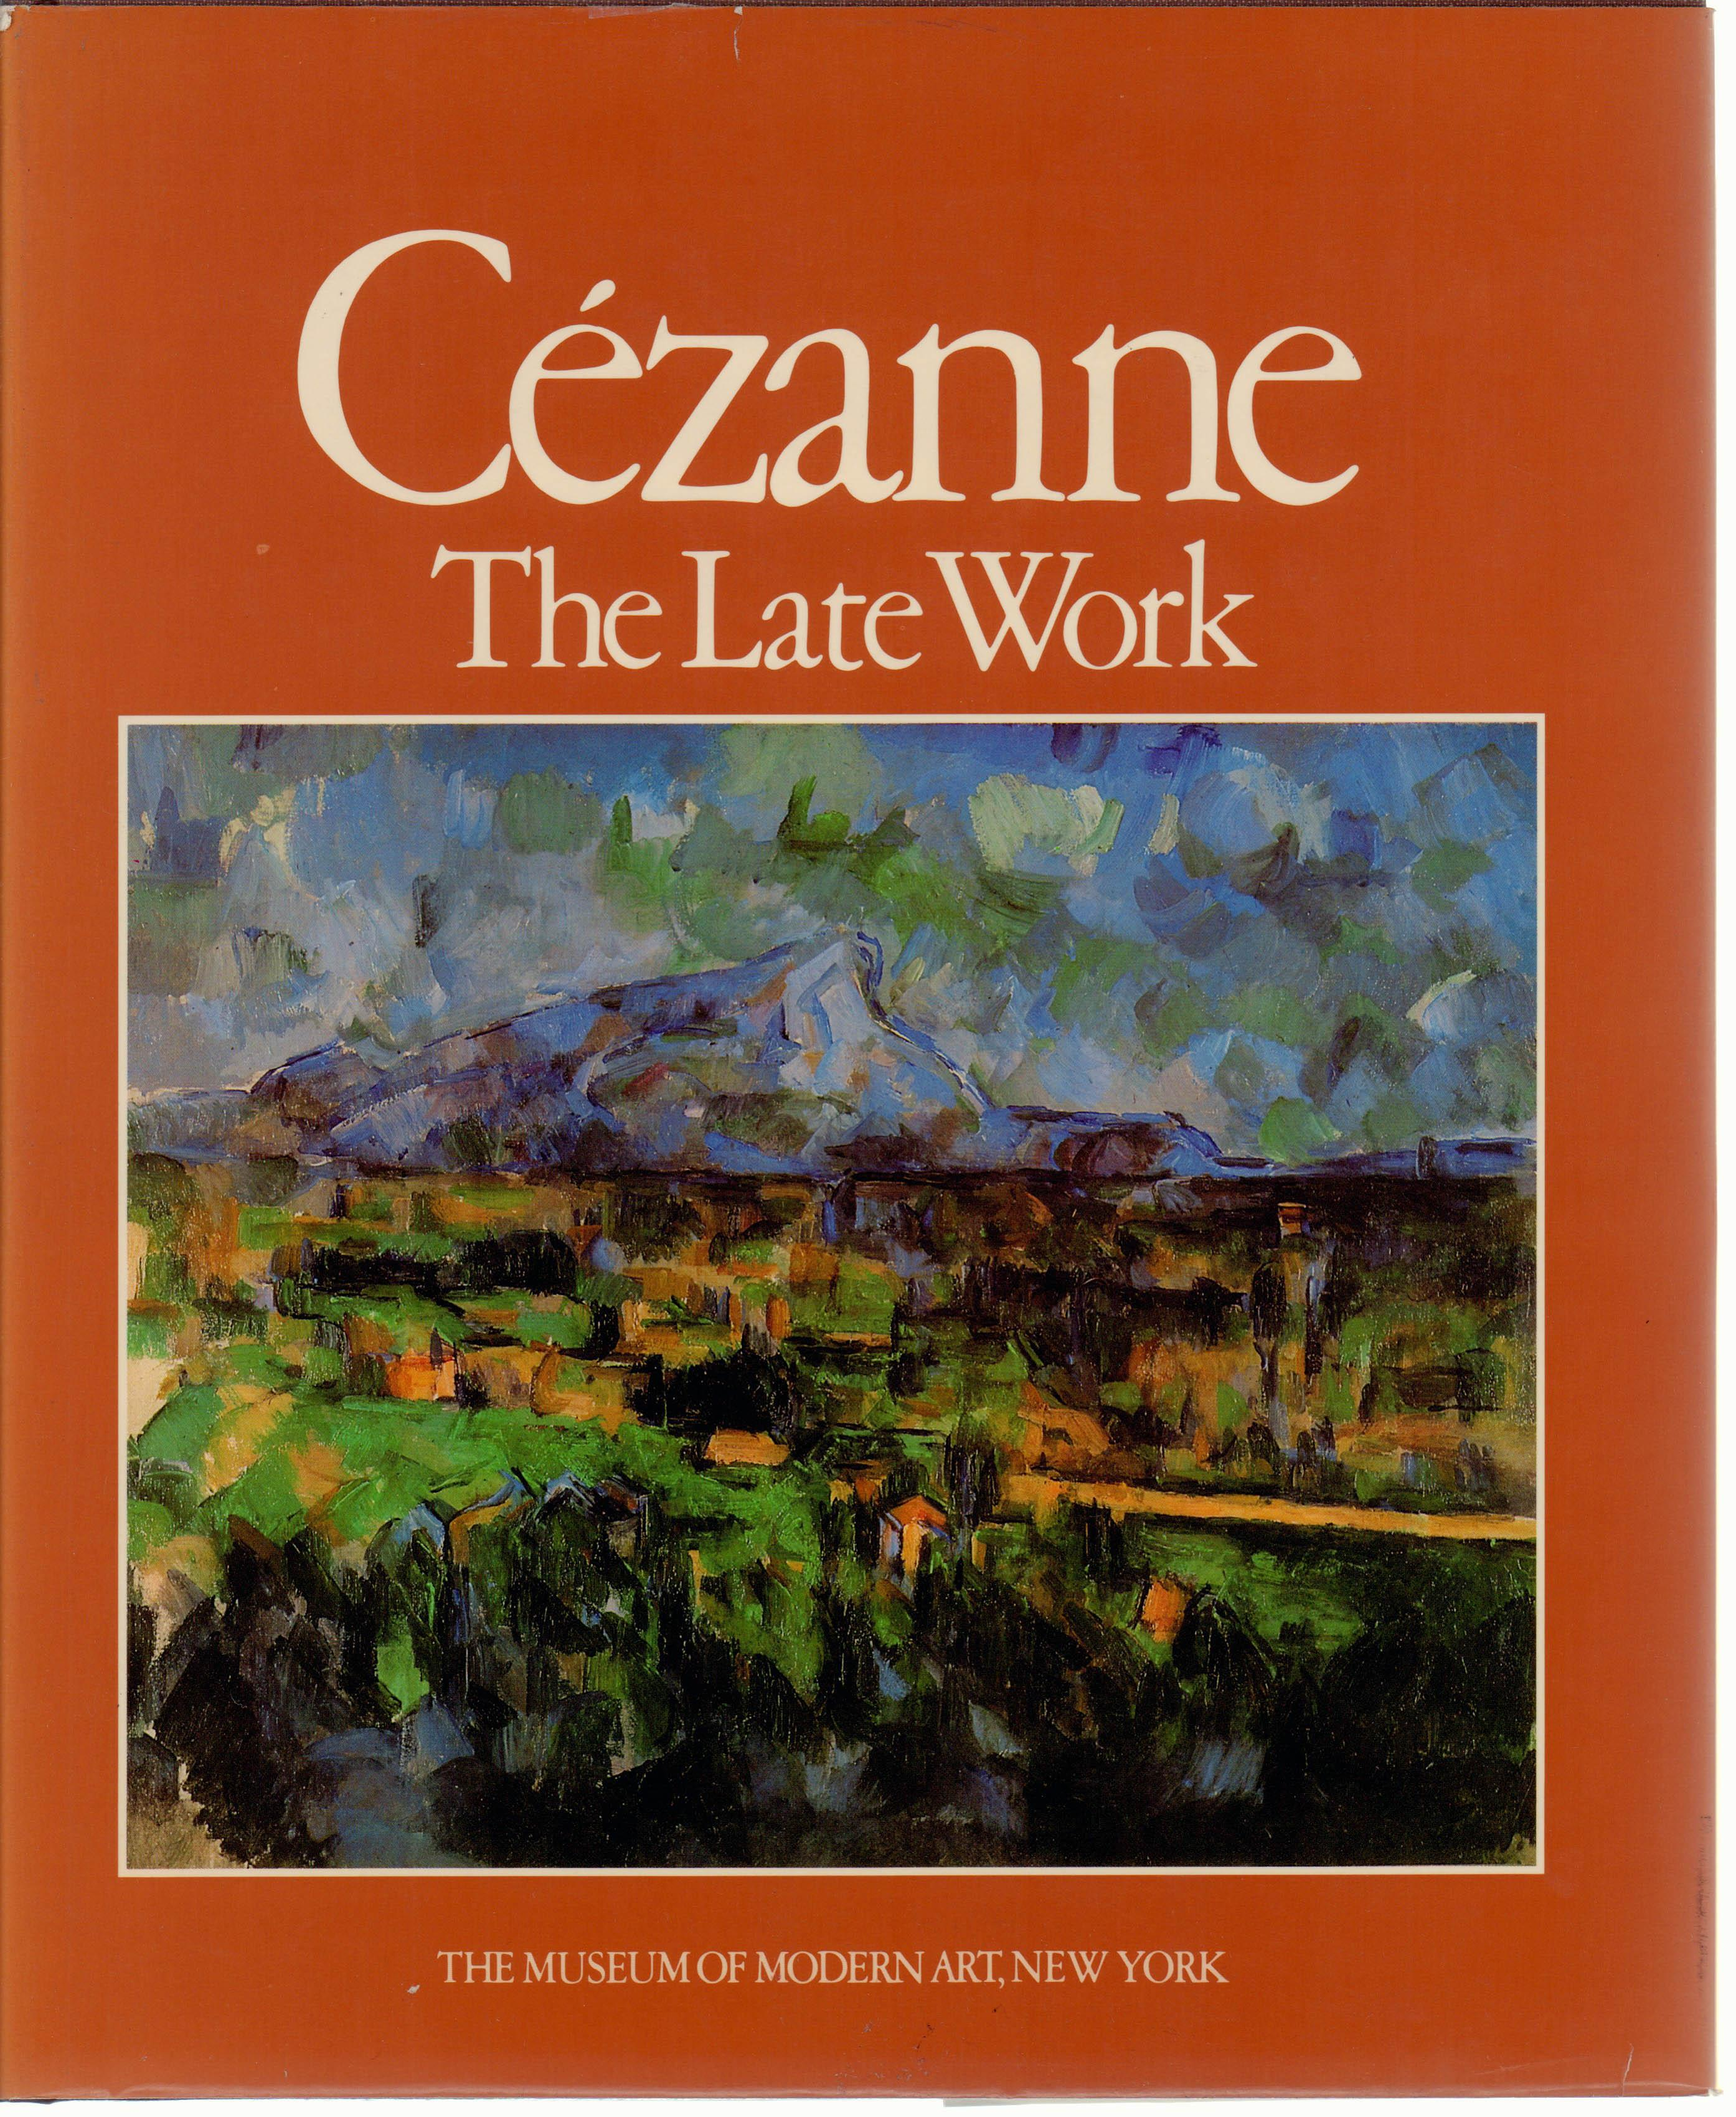 Cezanne The Late Work Chairish